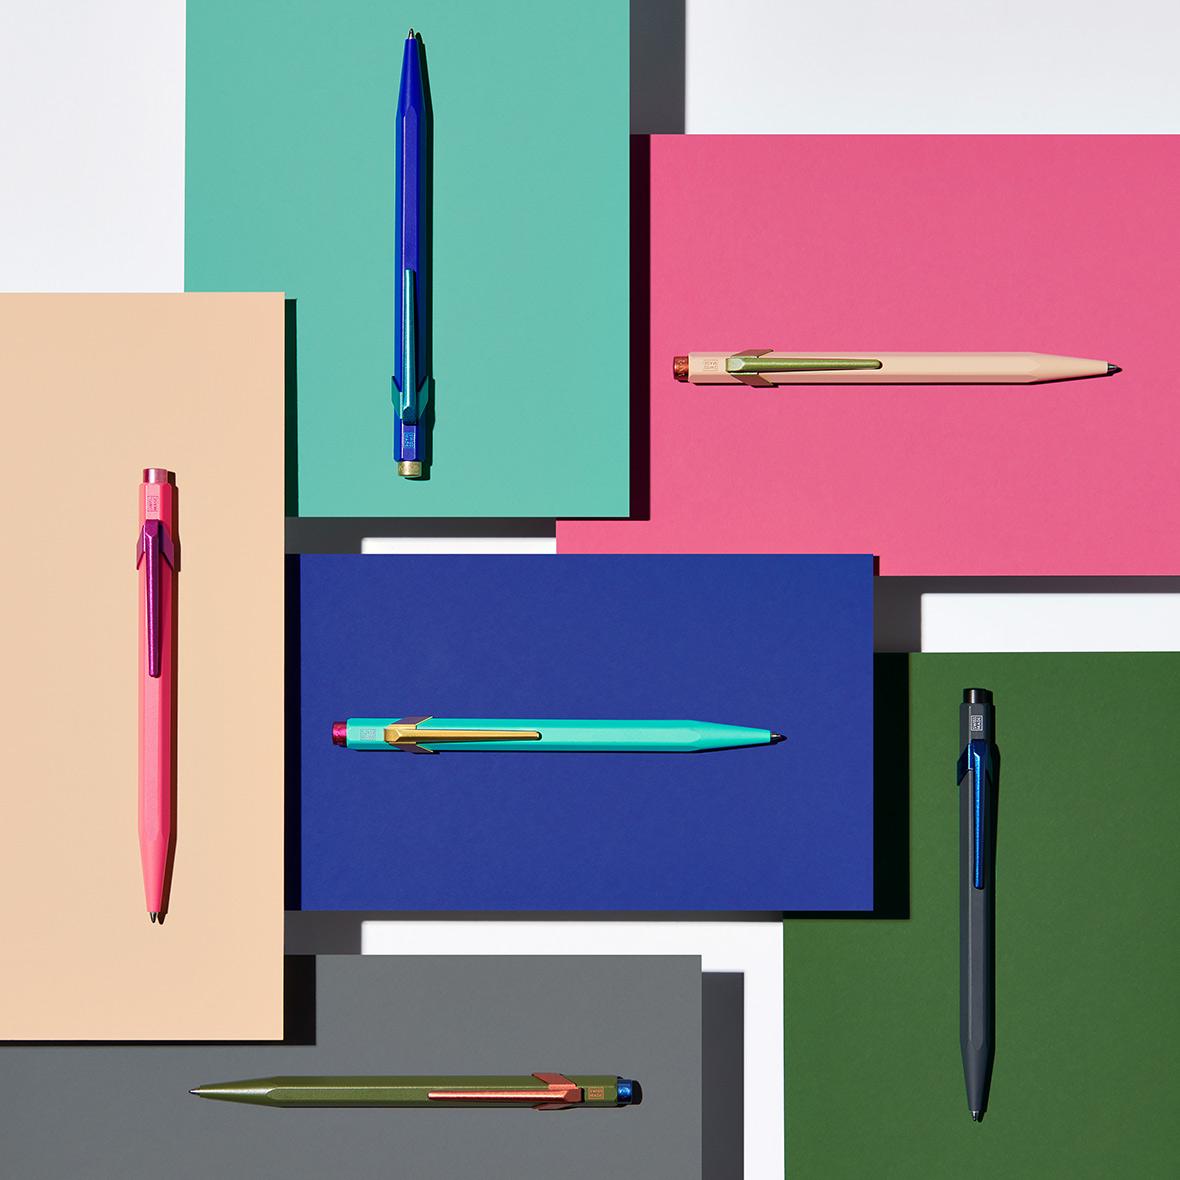 Kugelschreiber 849 Claim Your Style